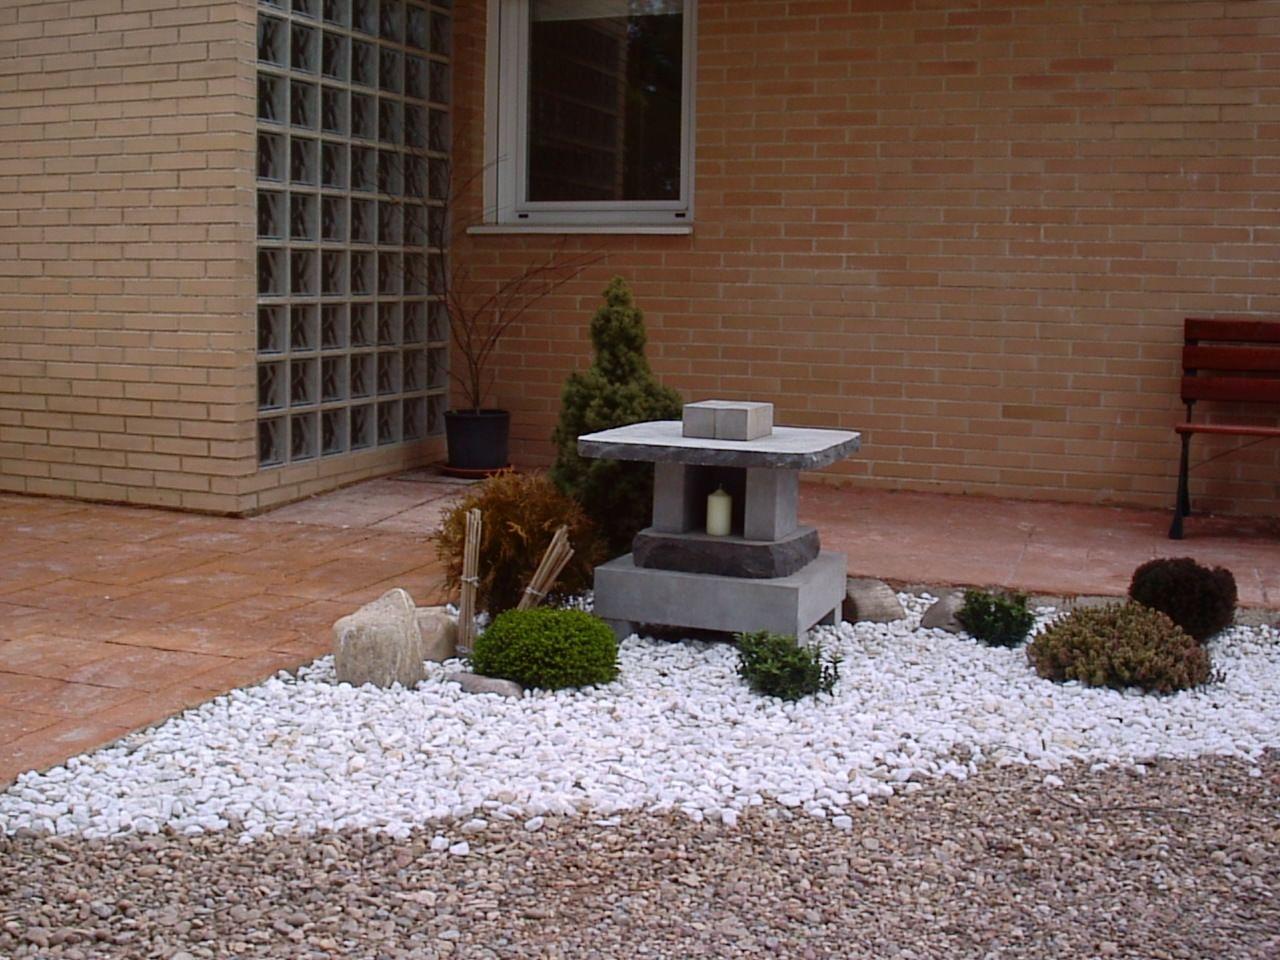 Jardin japones en miniatura exteriores pinterest for Jardines japoneses en miniatura